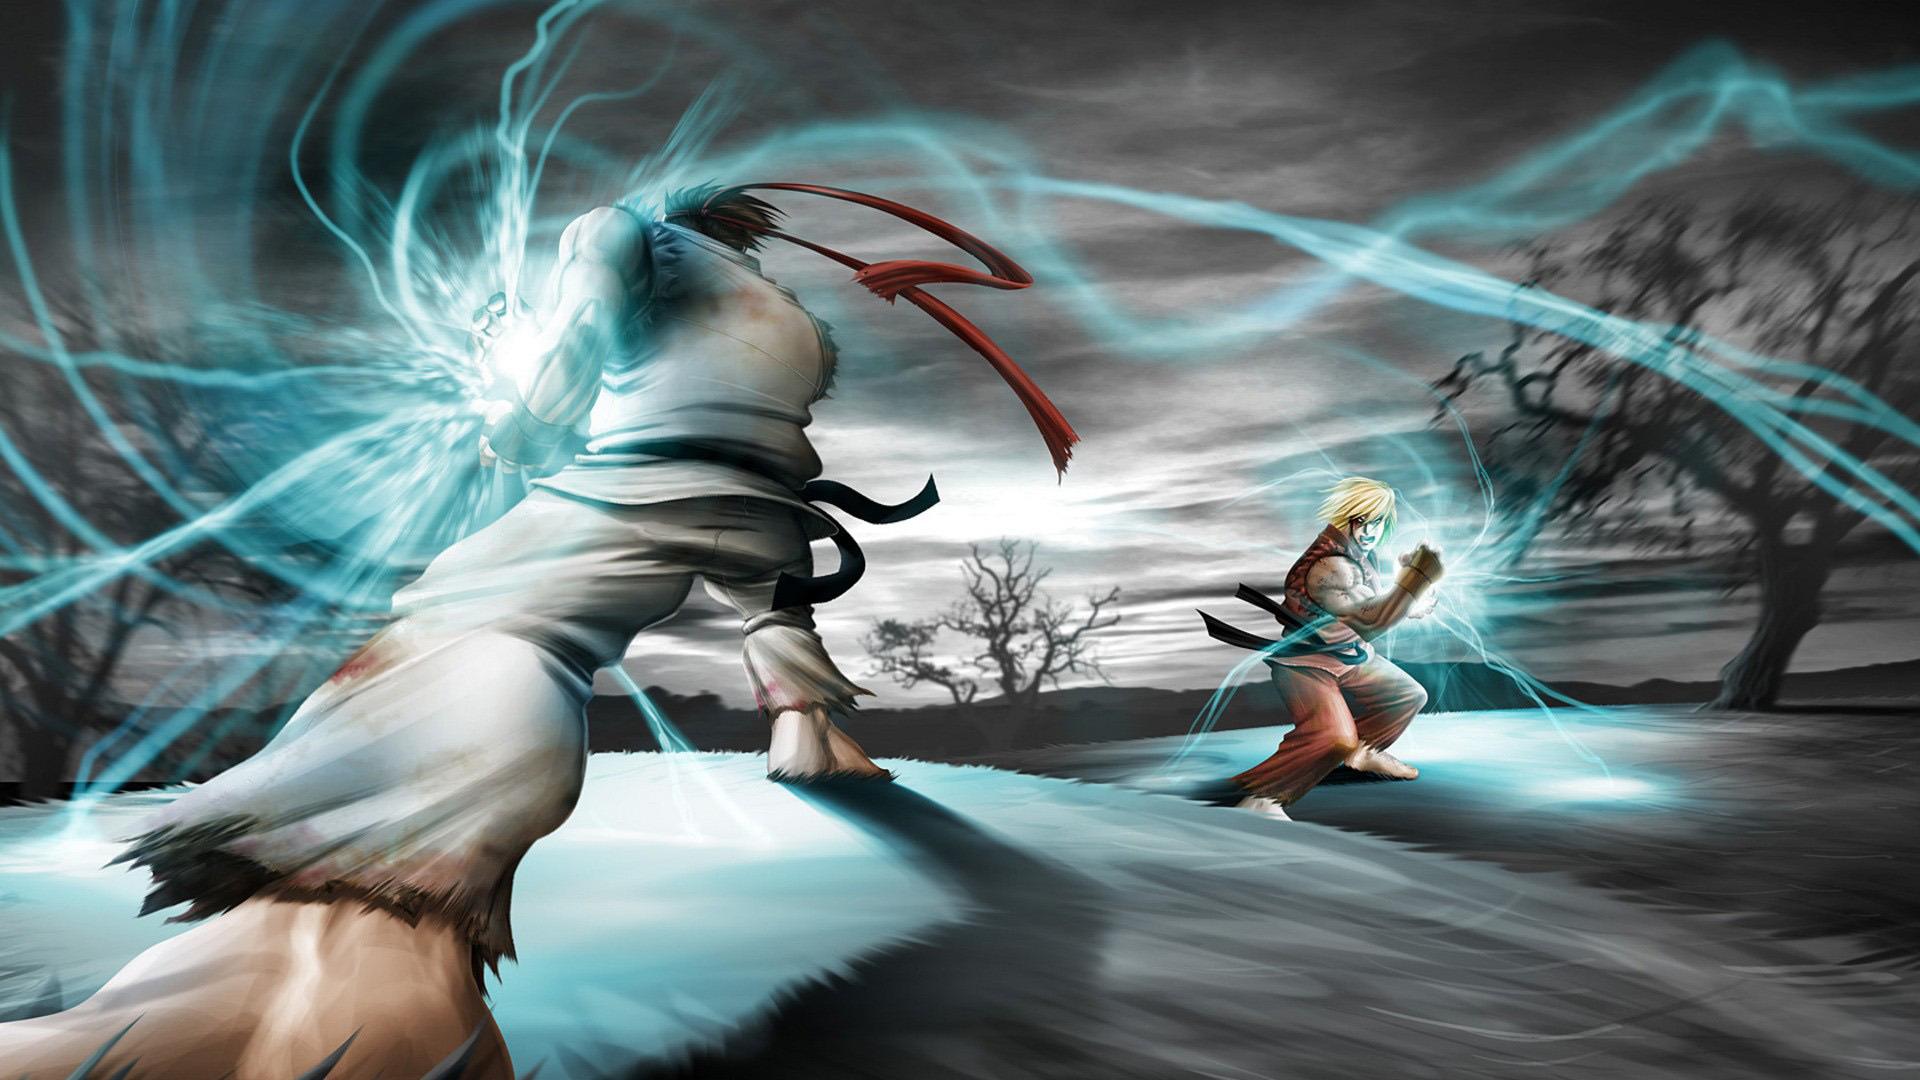 Street fighter ryu wallpaper wallpapersafari - Ken hd wallpaper ...